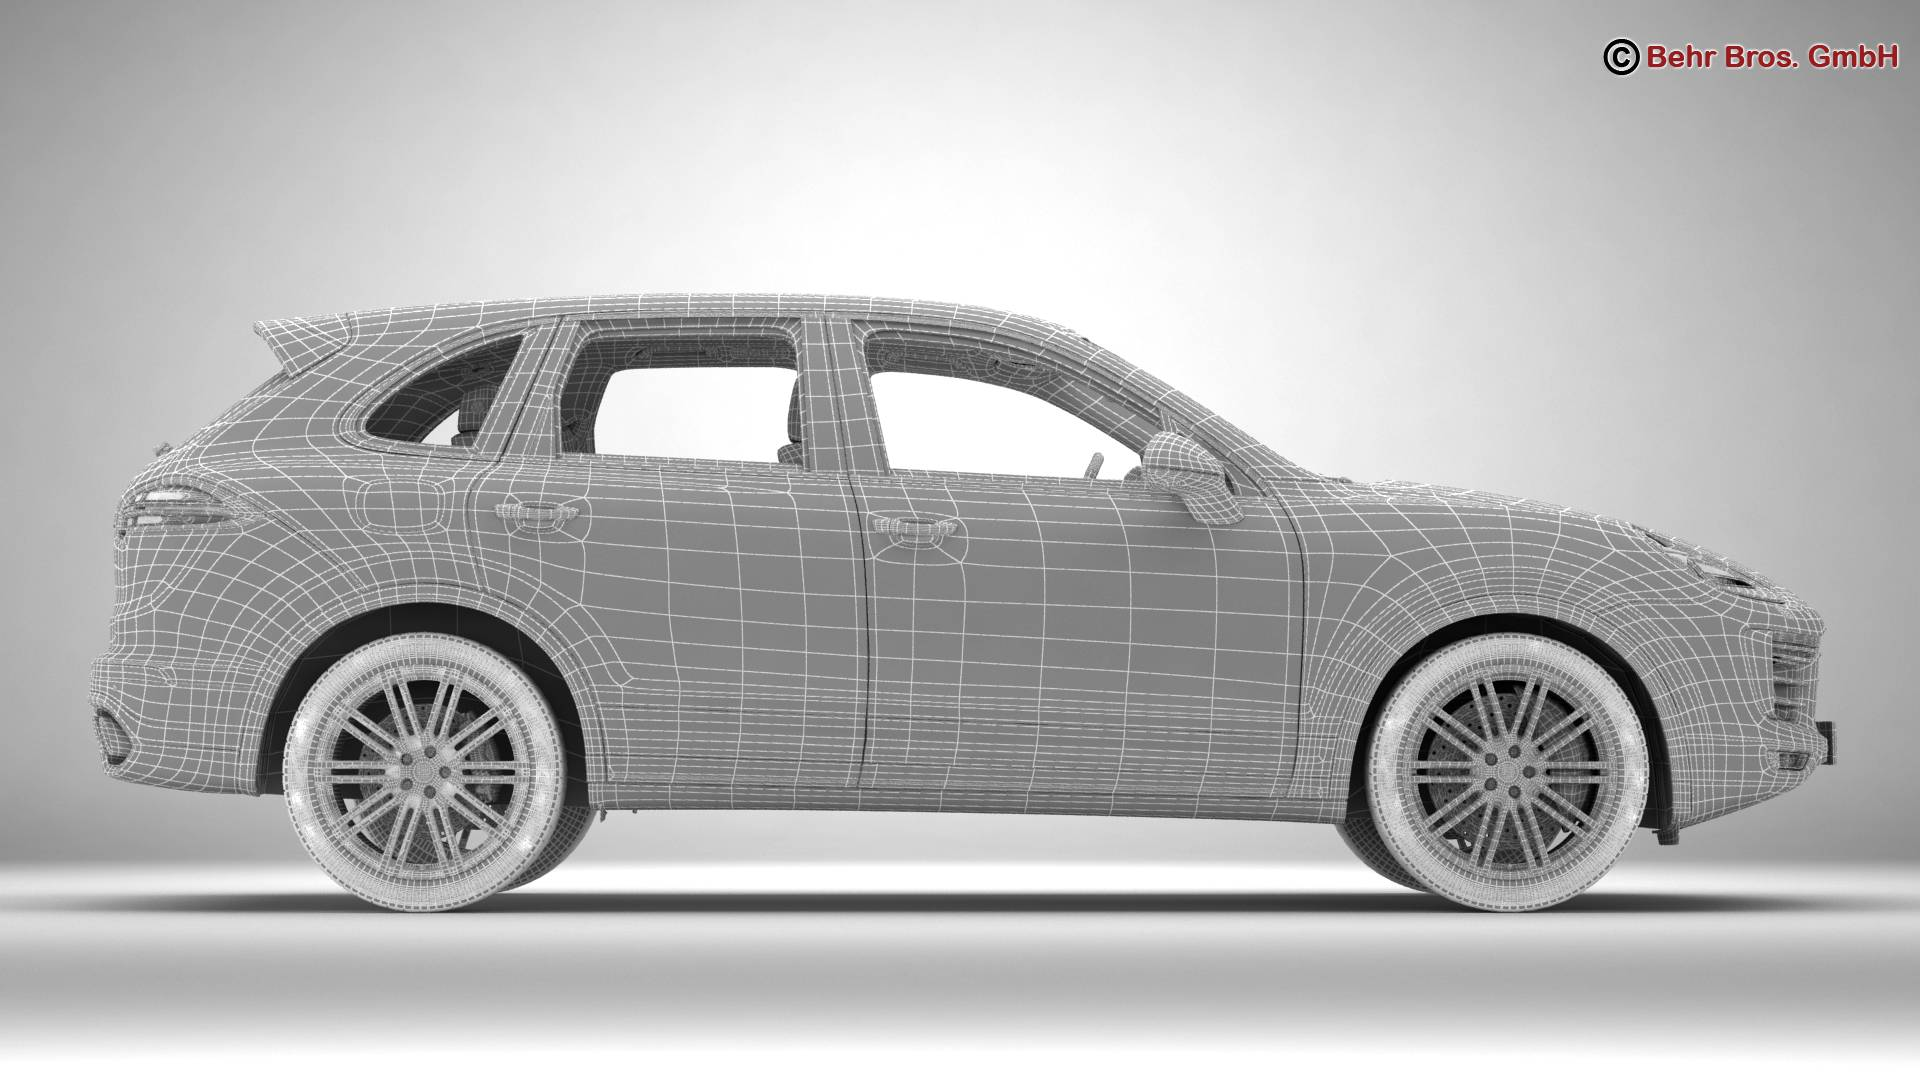 porsche cayenne turbo s 2016 3d model 3ds max fbx c4d lwo ma mb obj 214946